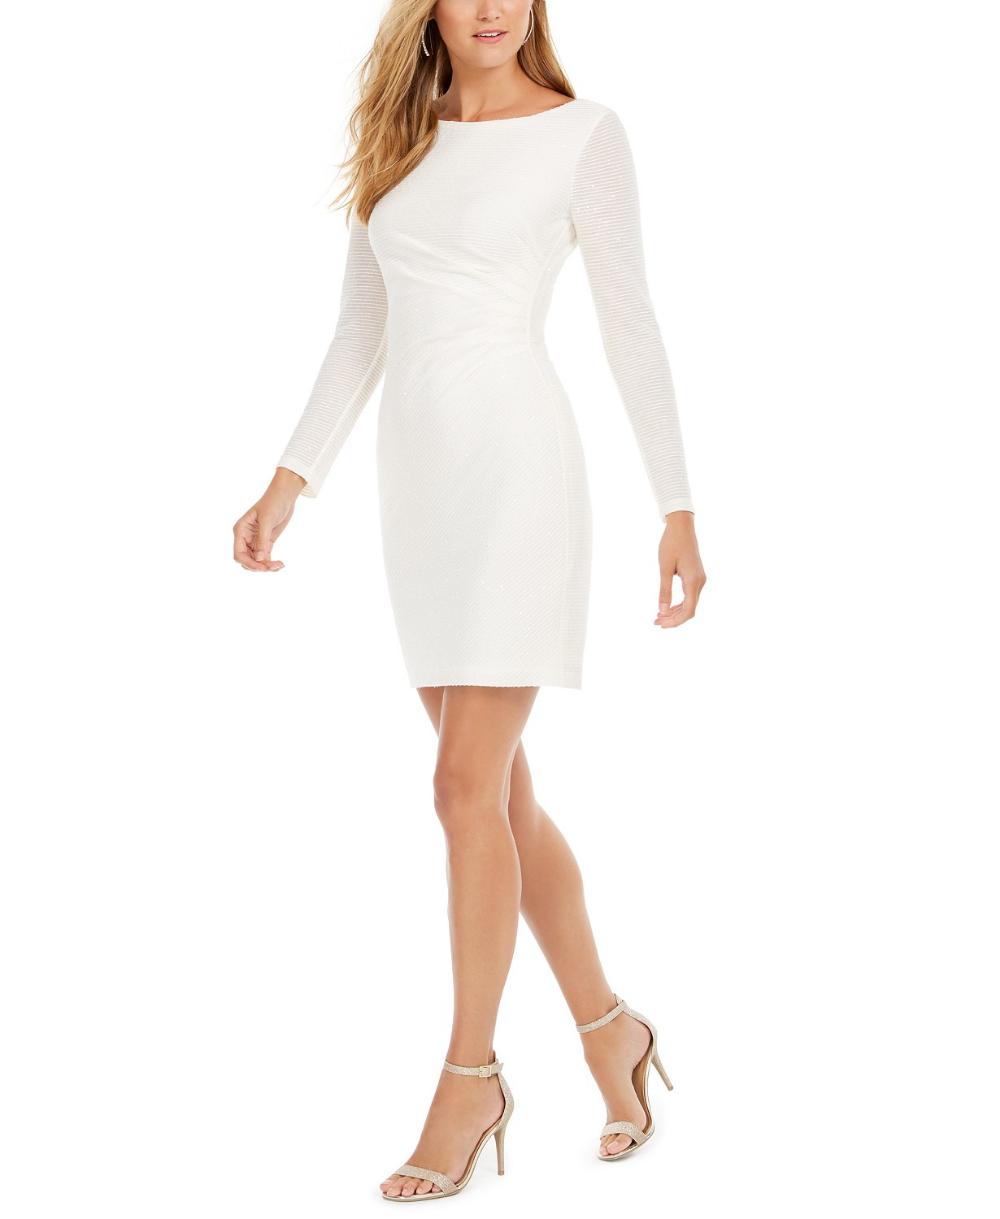 Vince Camuto Sequined Sheath Dress Reviews Dresses Women Macy S Women Clothes Sale Dresses Long Sleeve Sheath Dress [ 1219 x 1000 Pixel ]